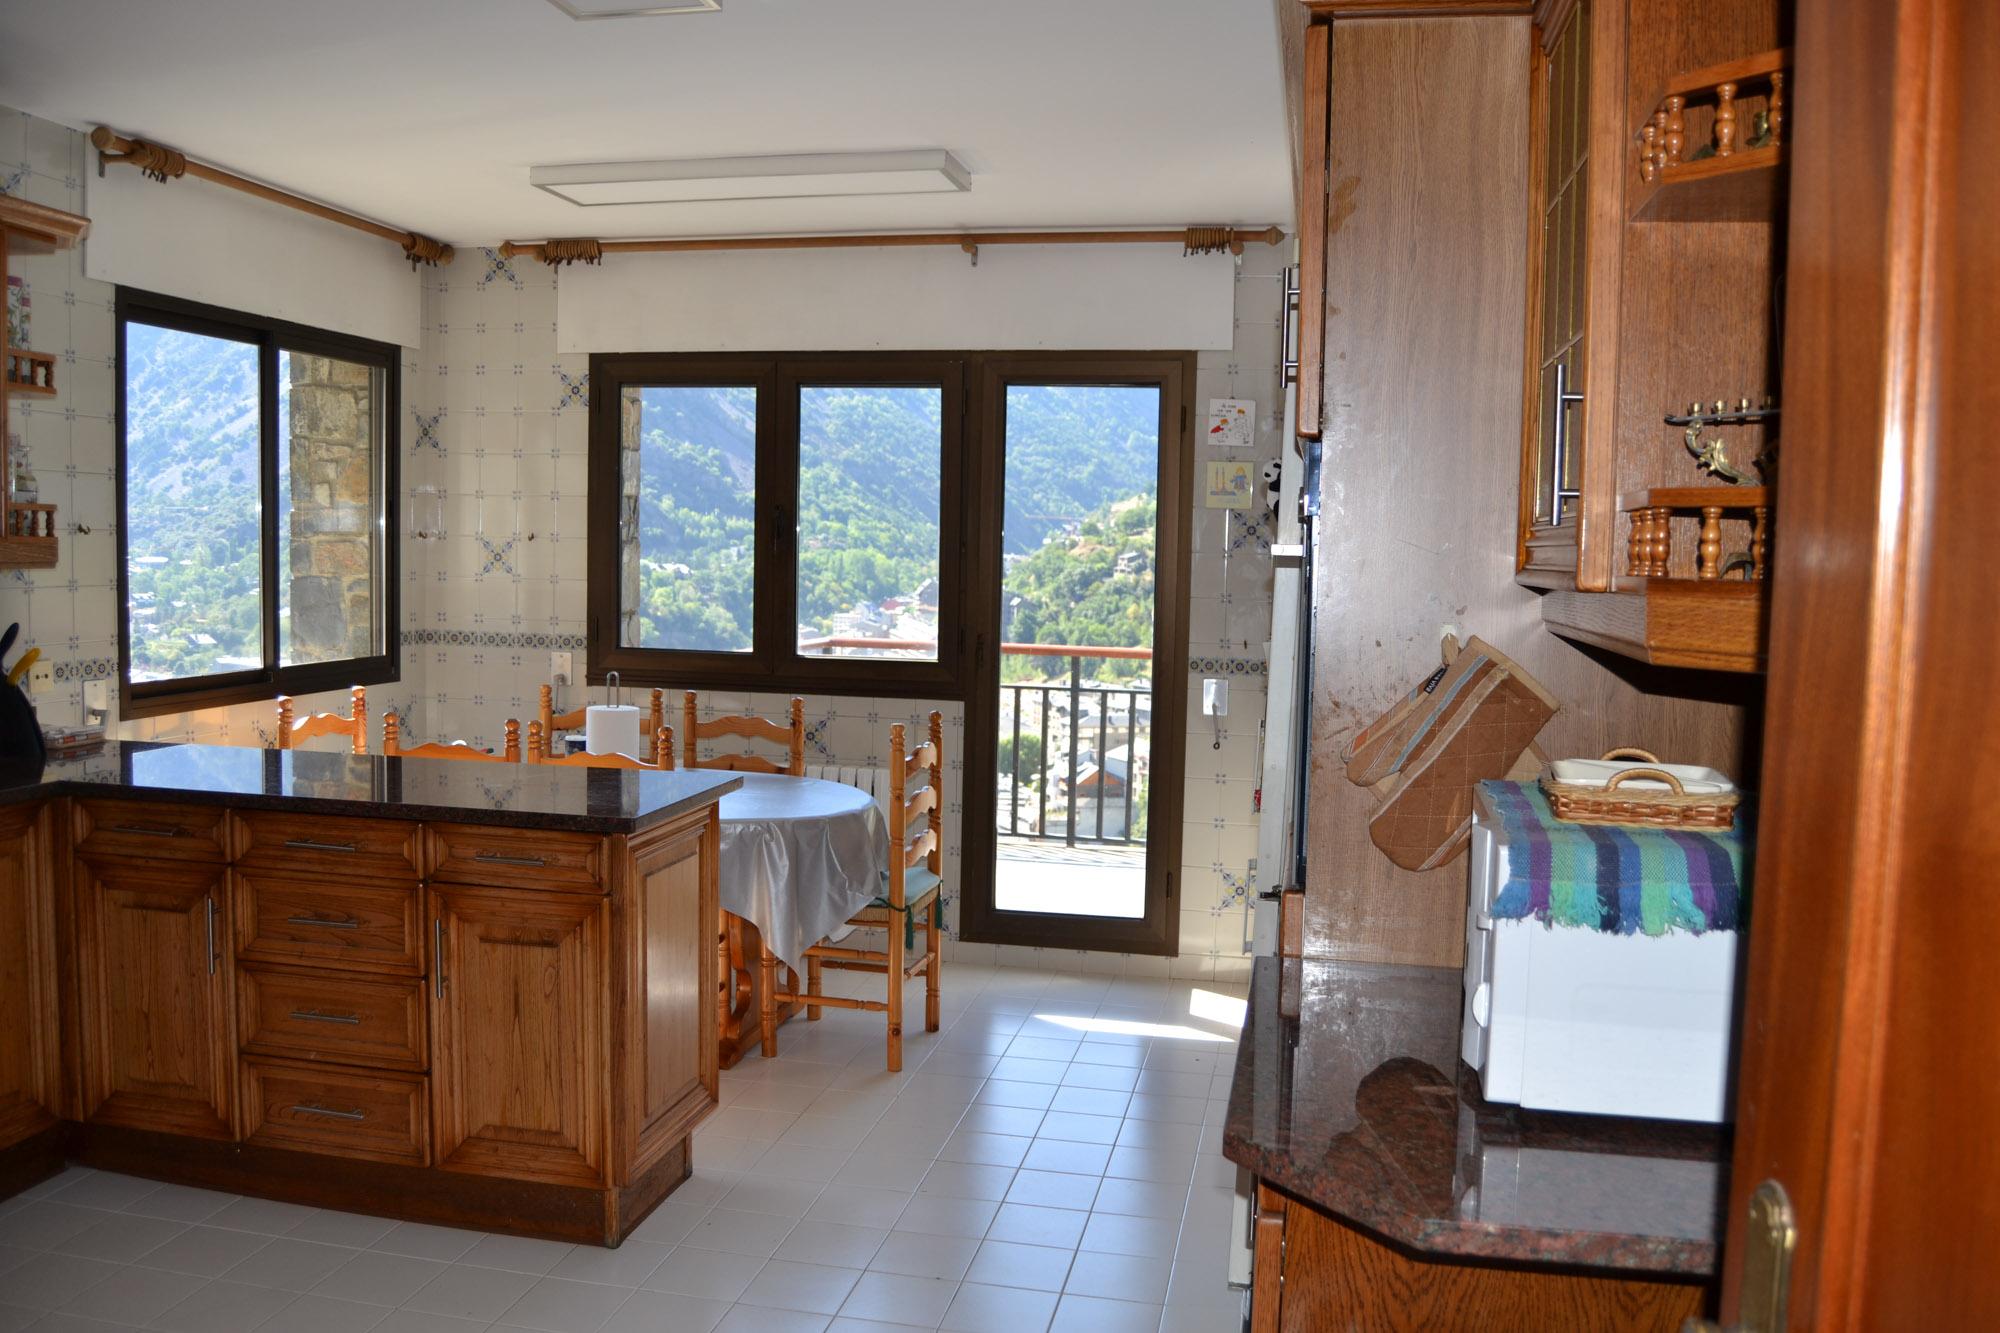 Xalet de lloguer a Escaldes Engordany, 5 habitacions, 342 metres